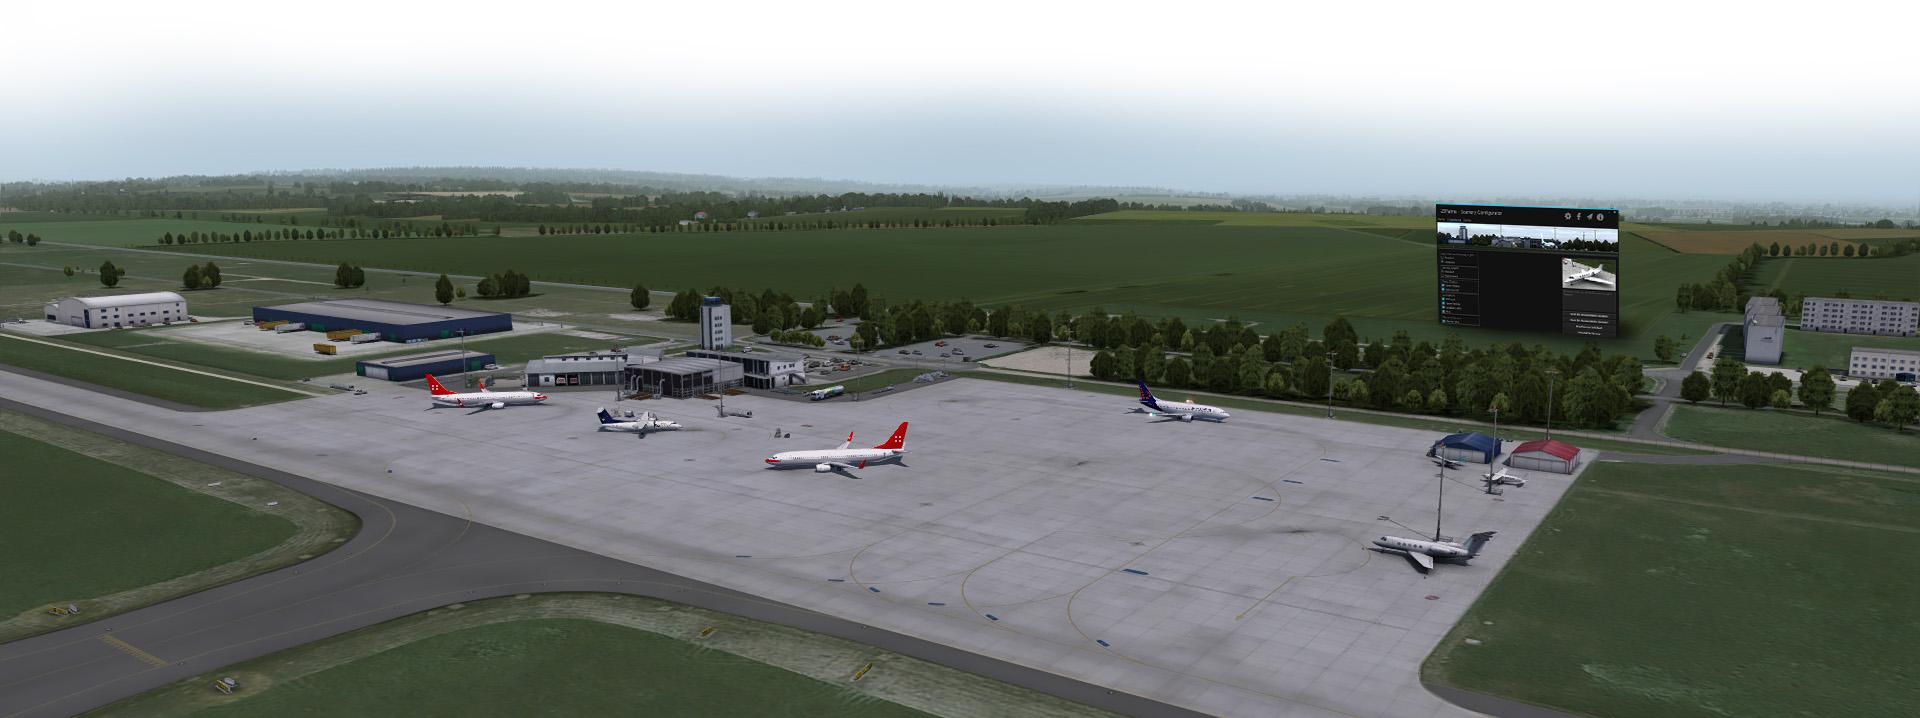 airport konfigurationsprogramm